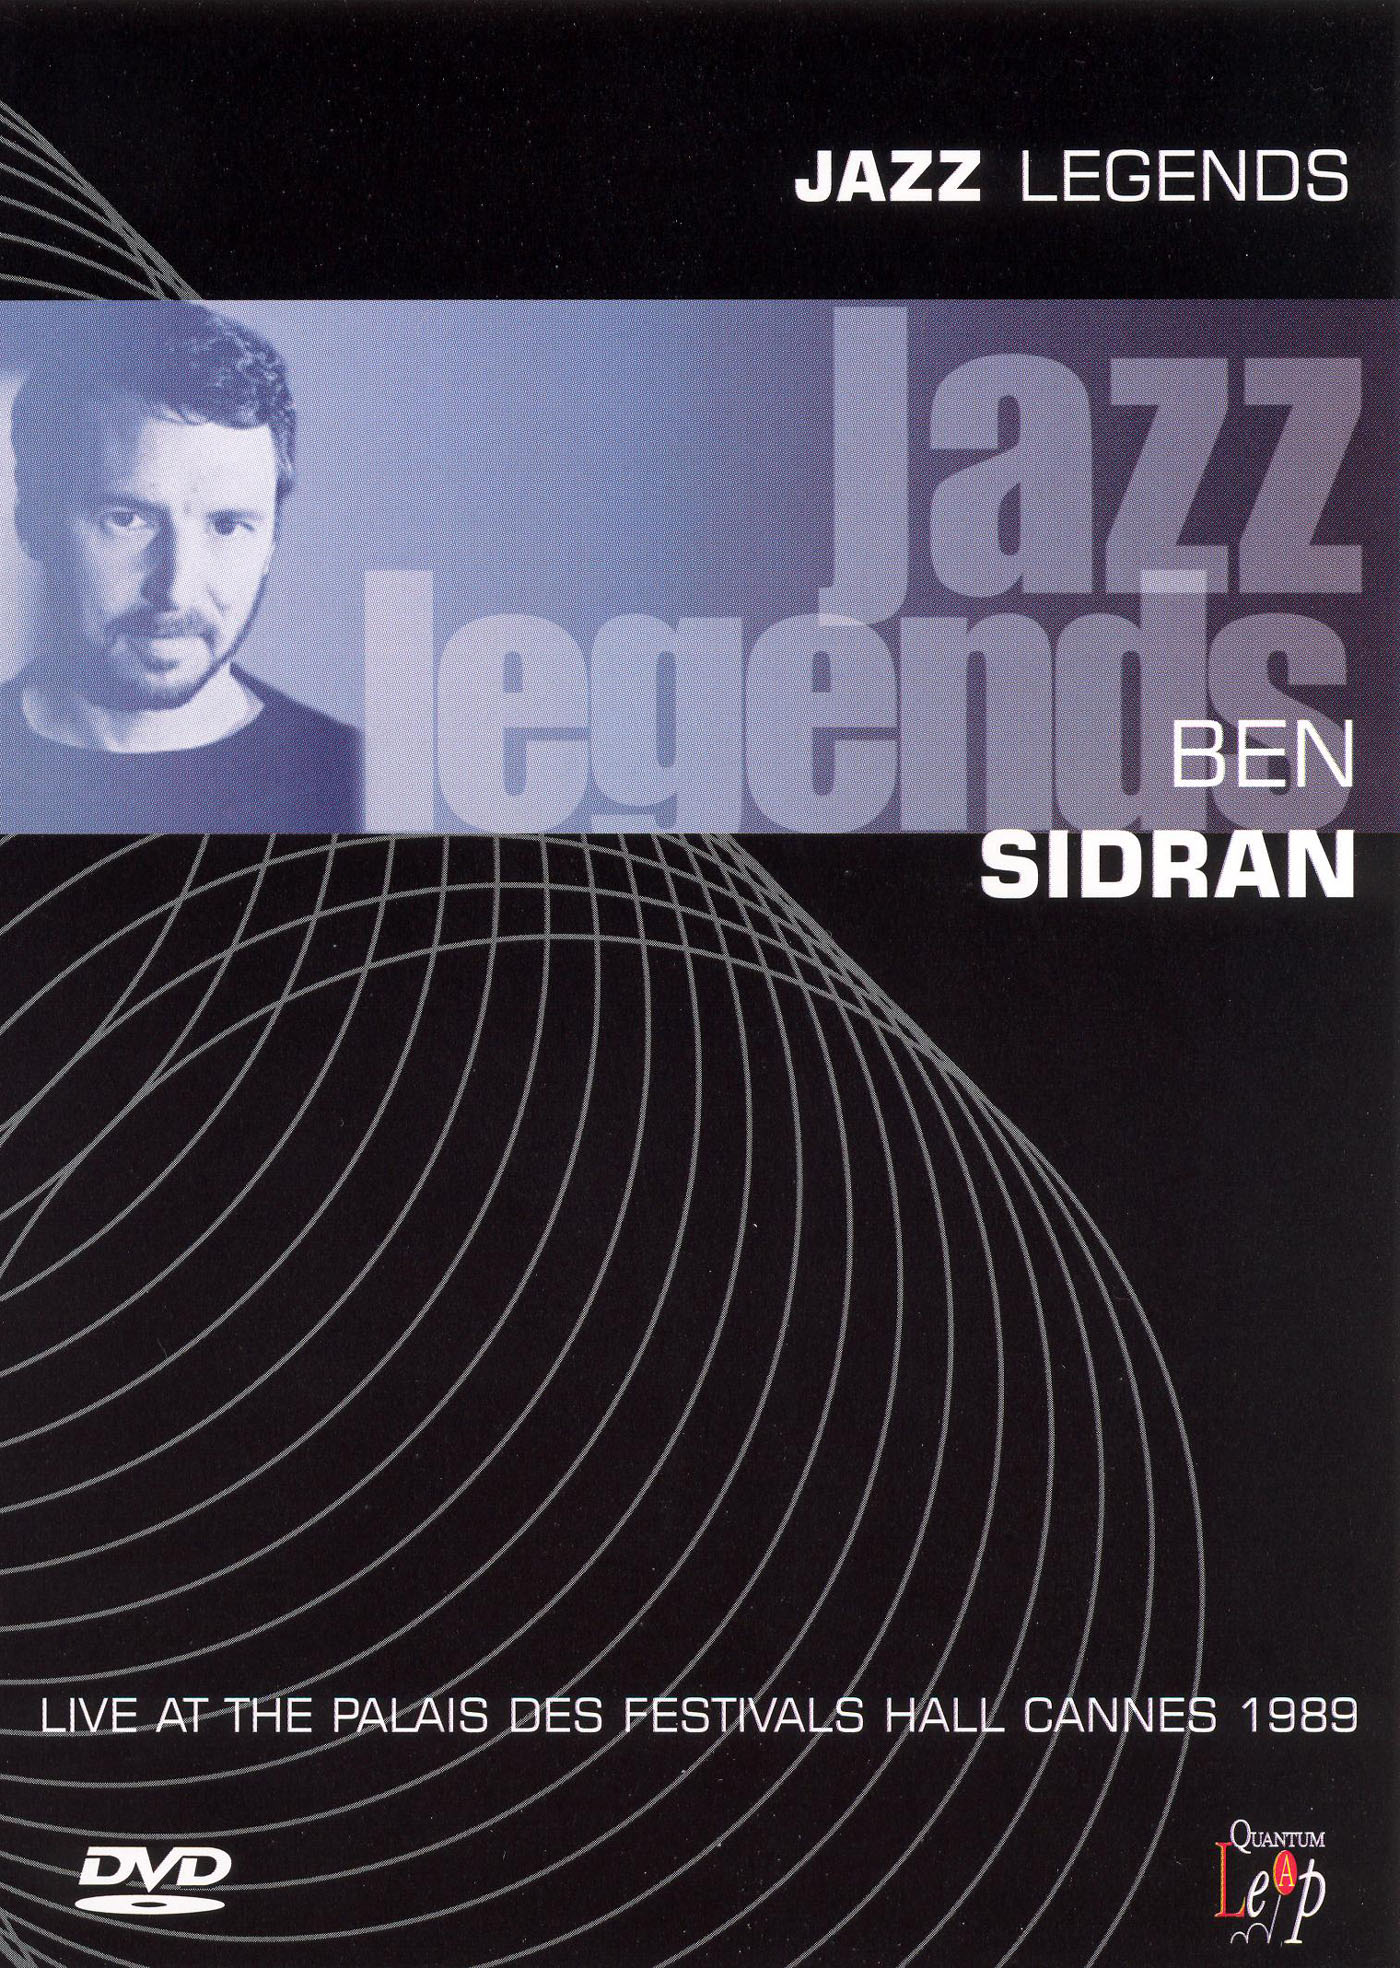 Jazz Legends: Ben Sidran - Live at the Palais des Festivals Hall Cannes 1989